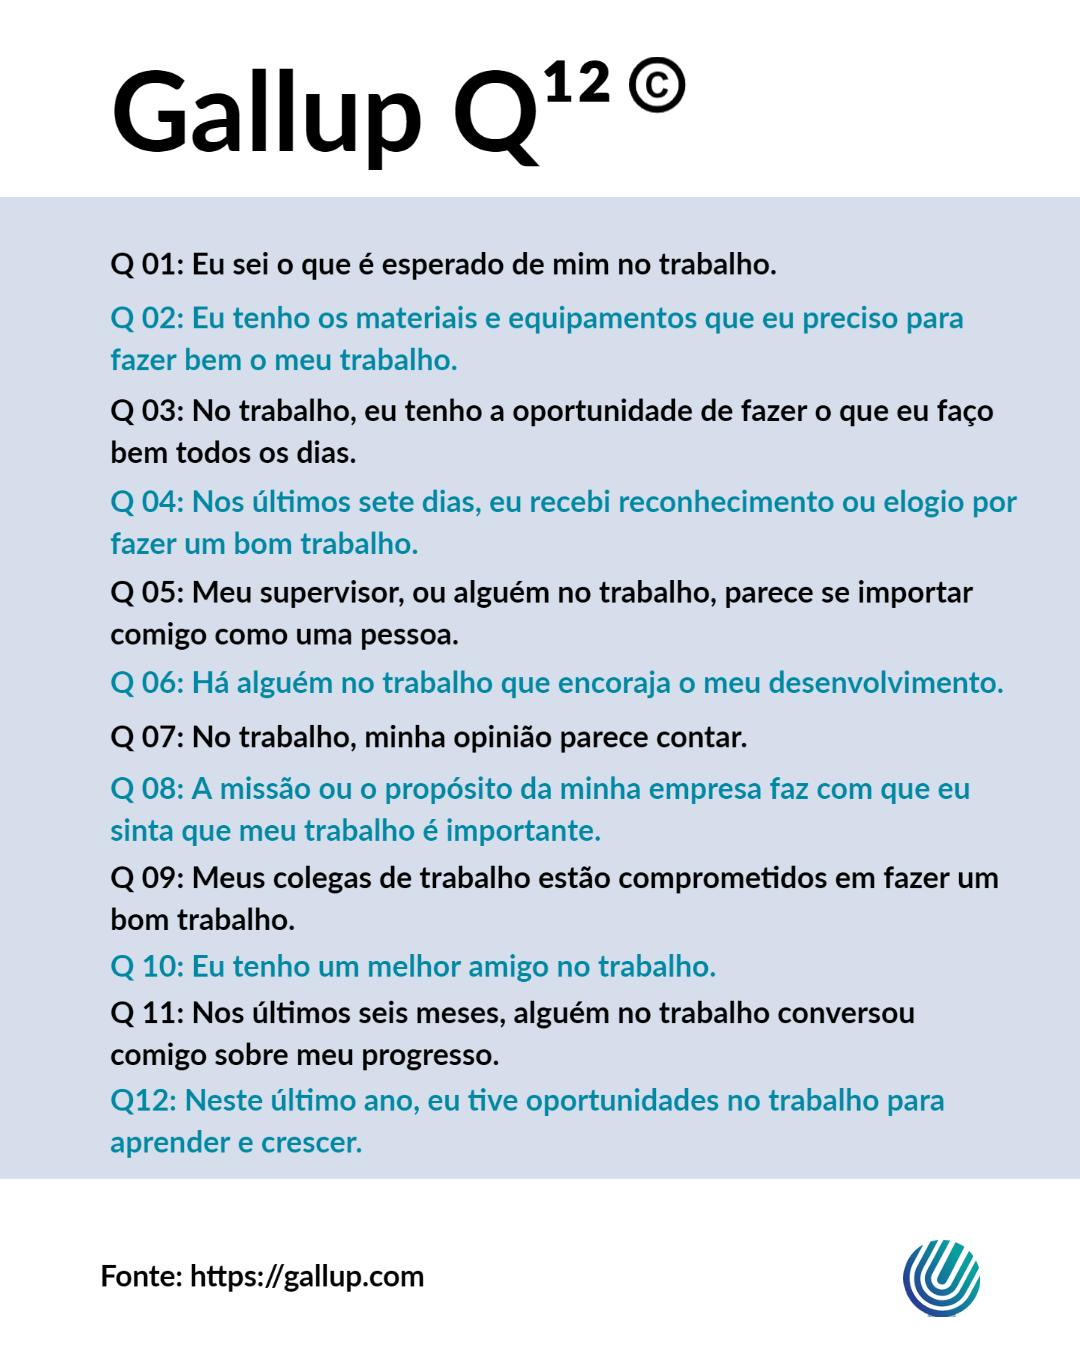 Questionario Gallup Q12